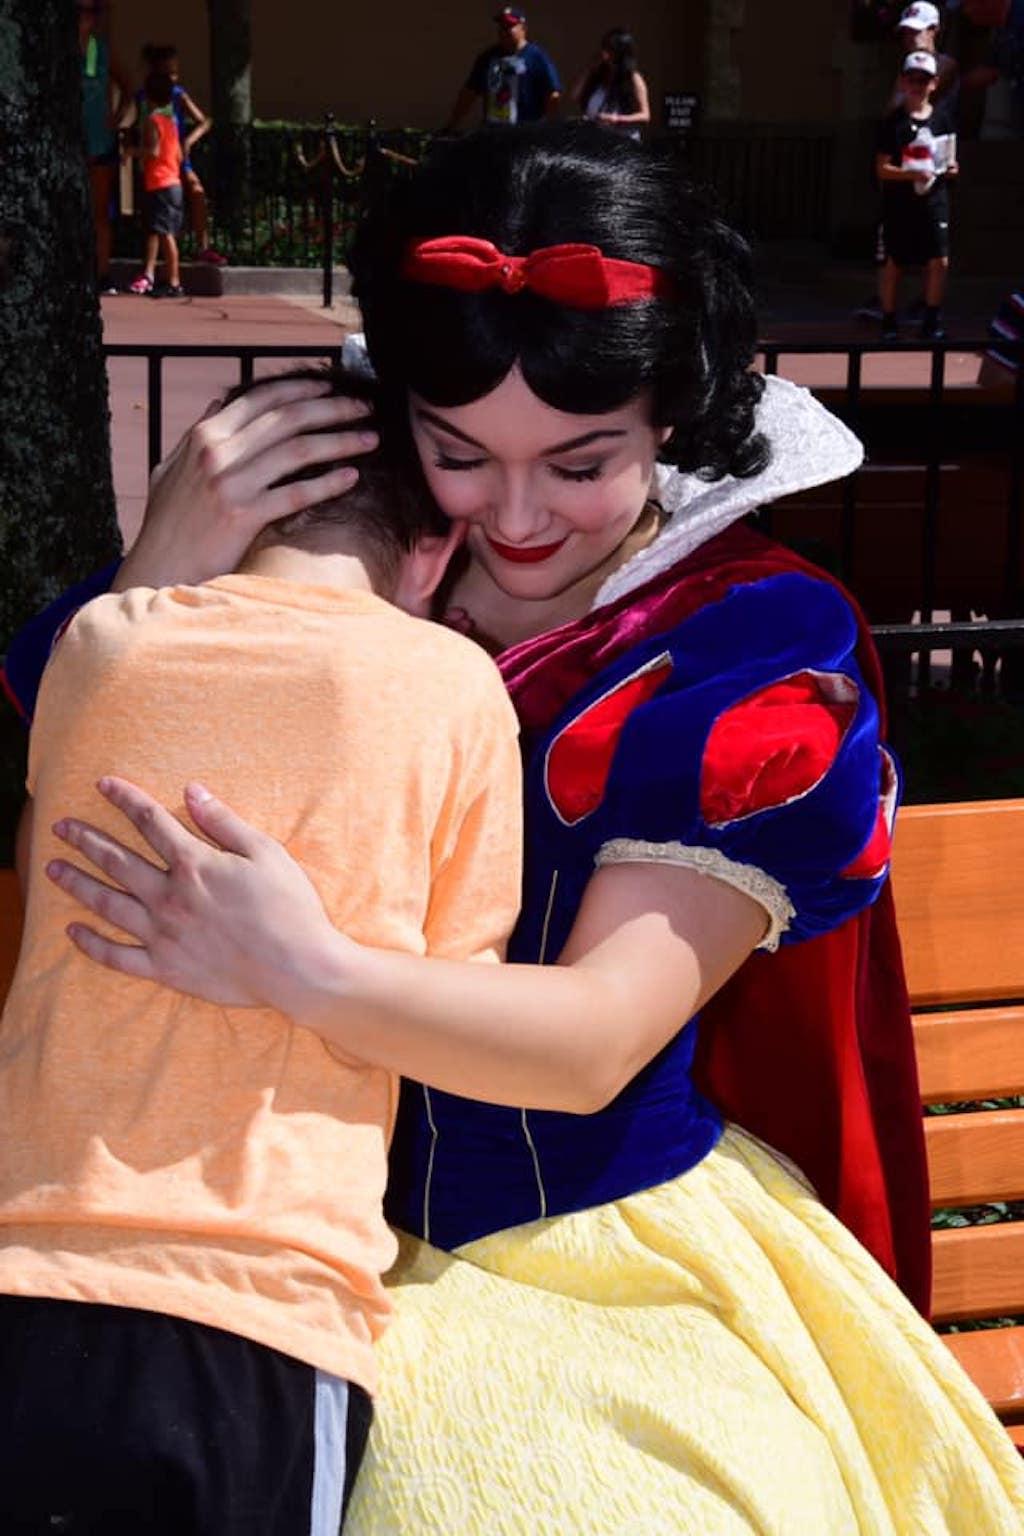 snow white comforts autistic child